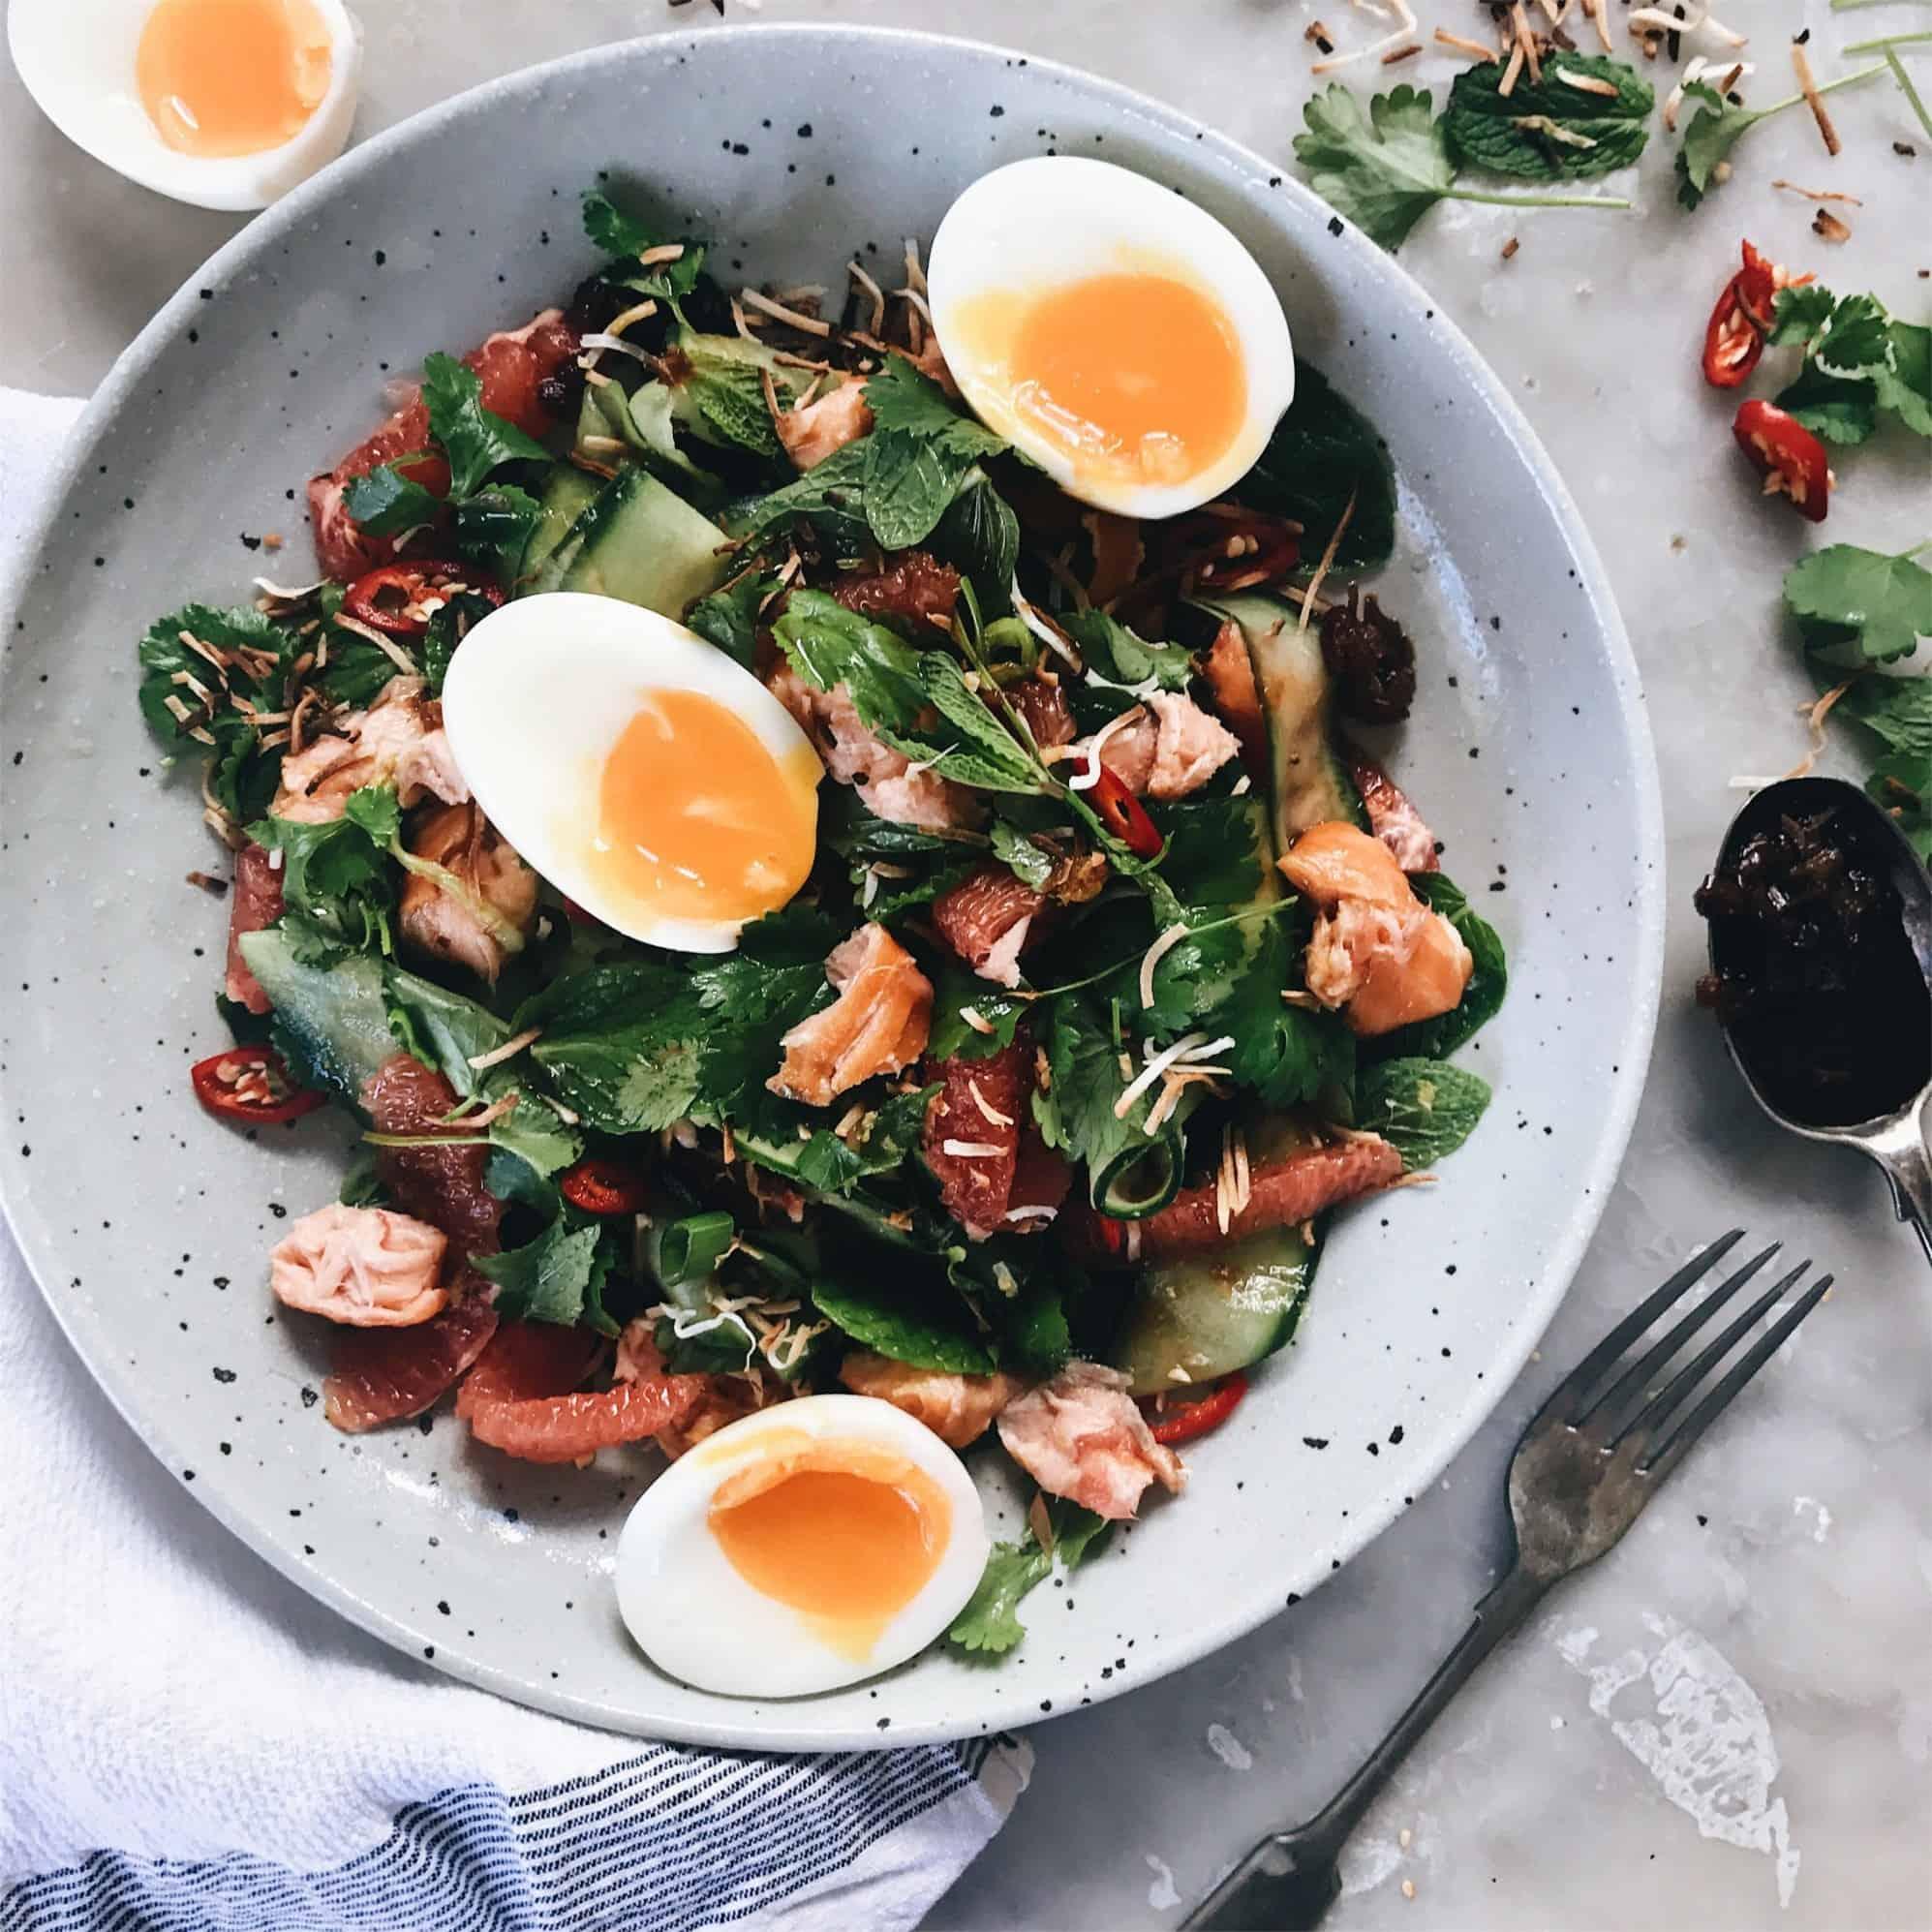 Hot Smoked Salmon & Pink Grapefruit Salad